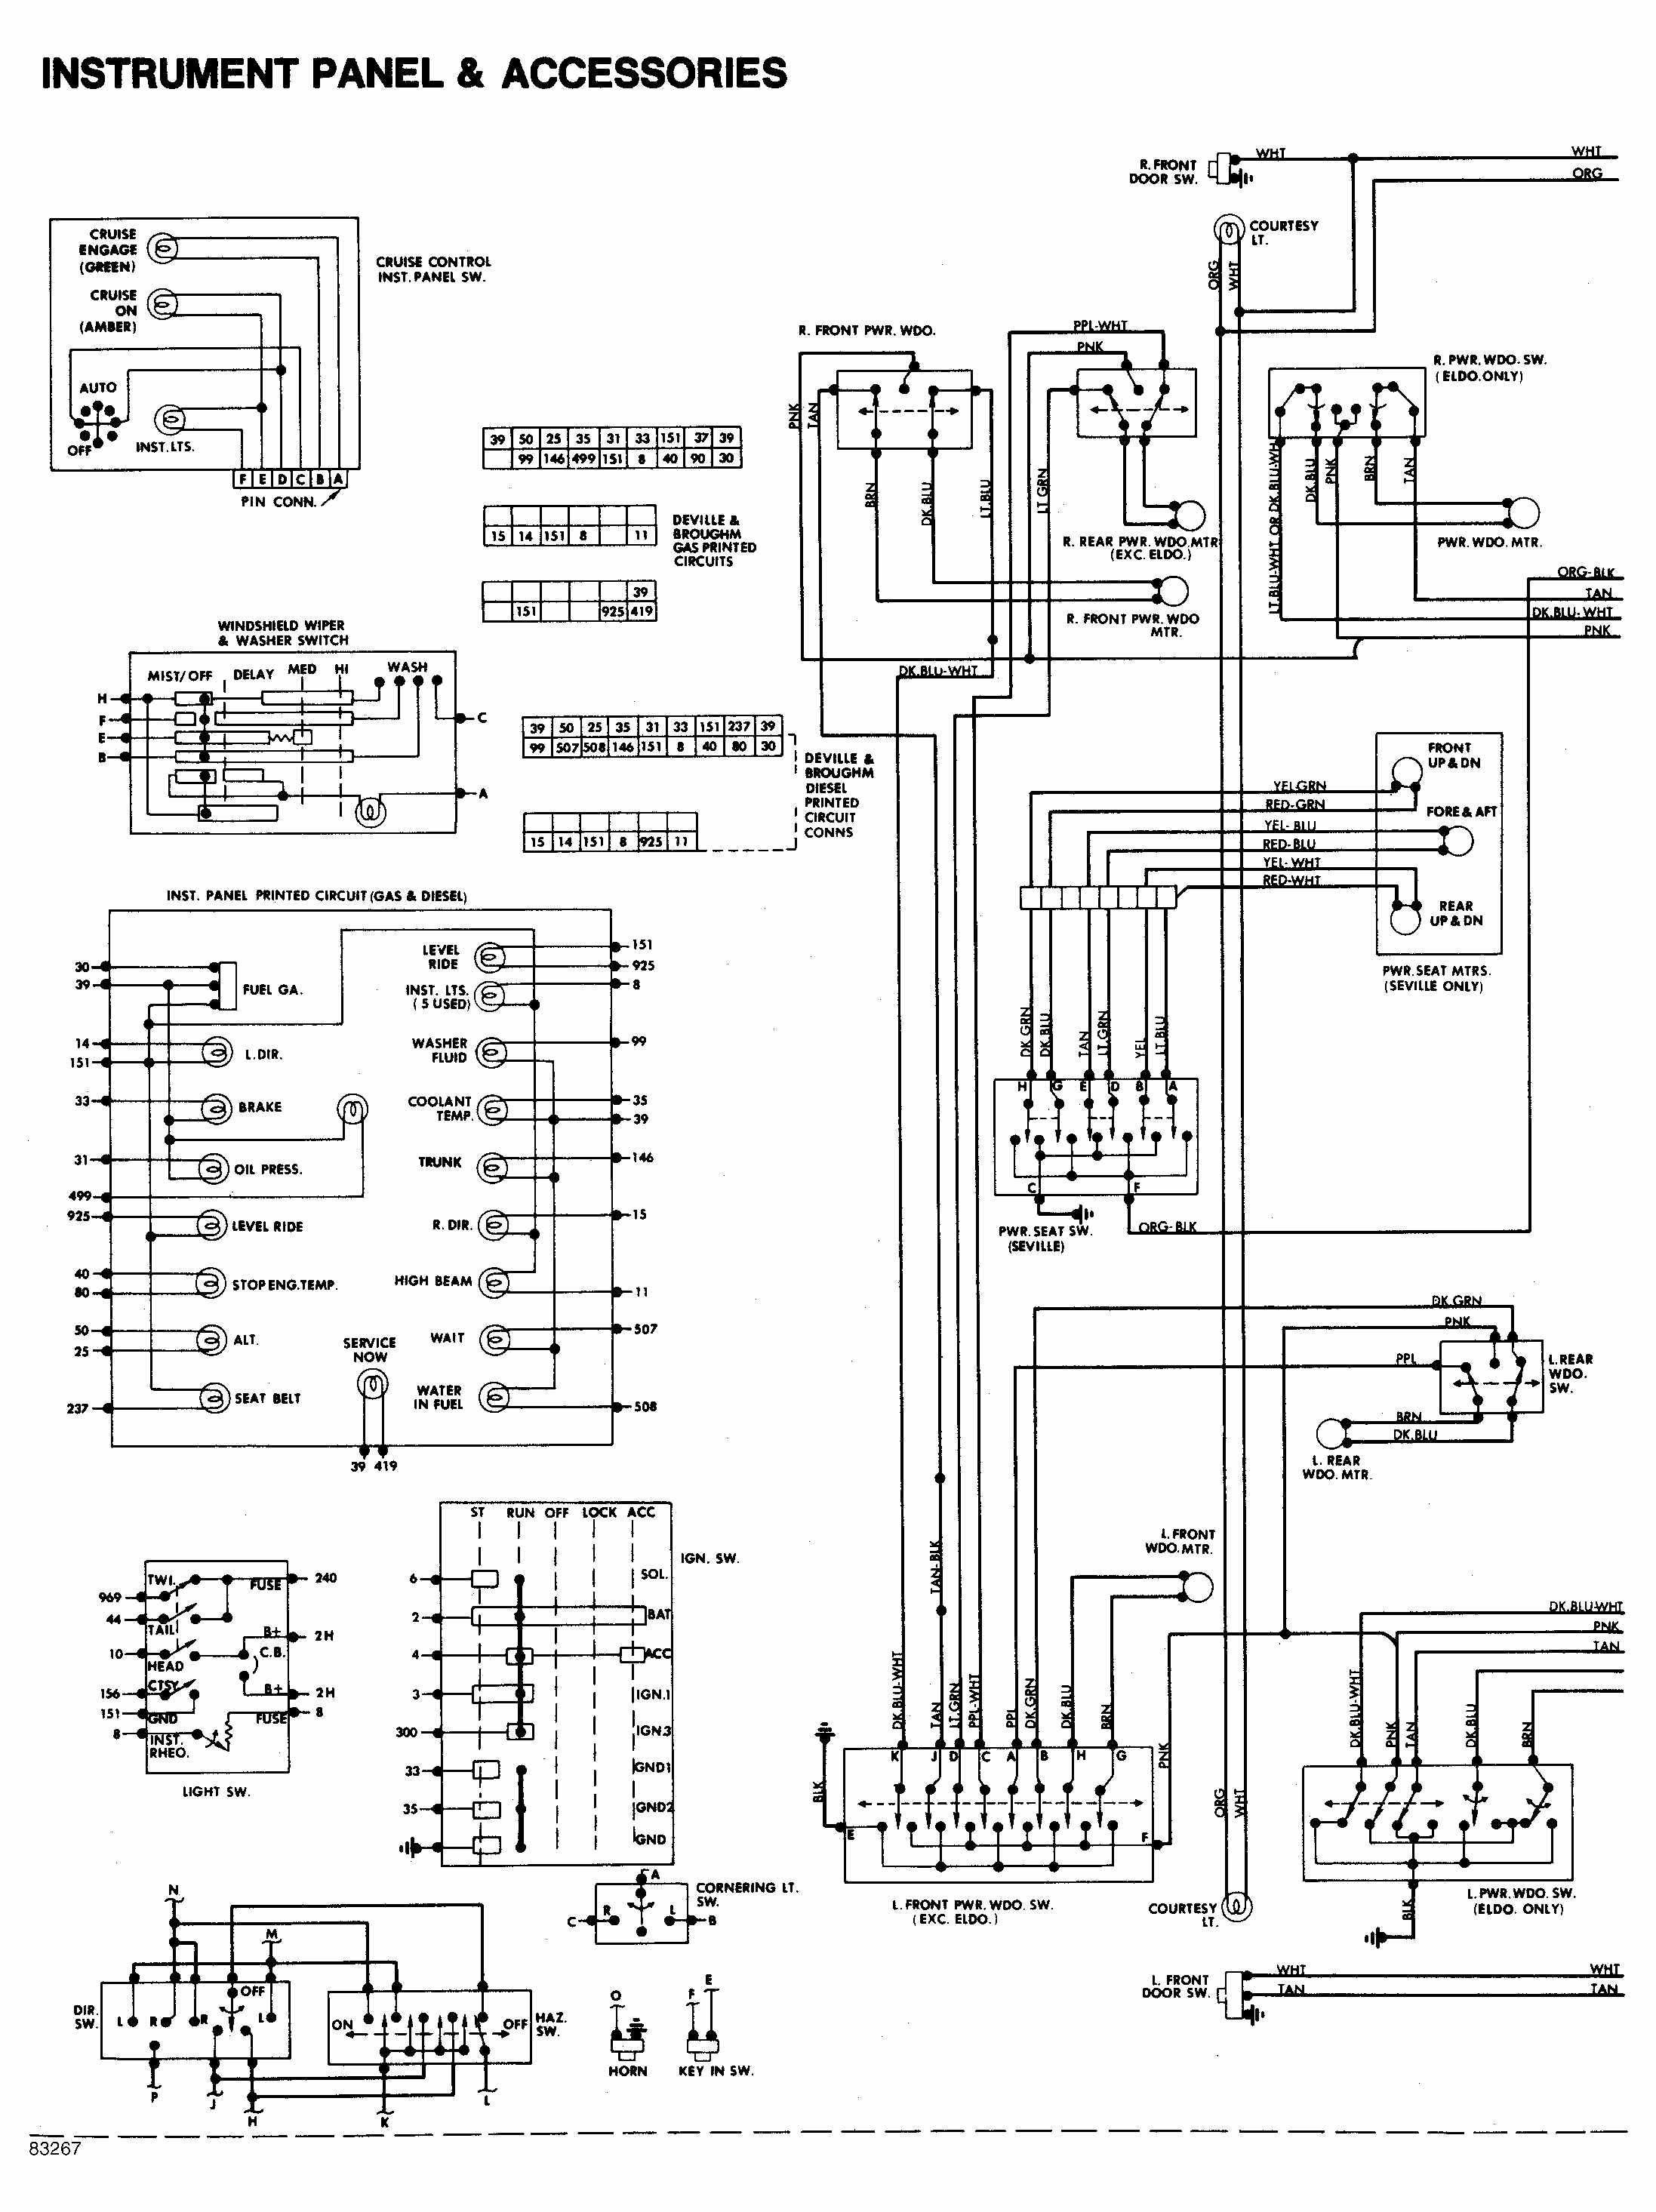 1997 Cadillac Deville Wiring Diagram Third Level 2006 Chrysler Diagrams 1992 Todays Pt Cruiser